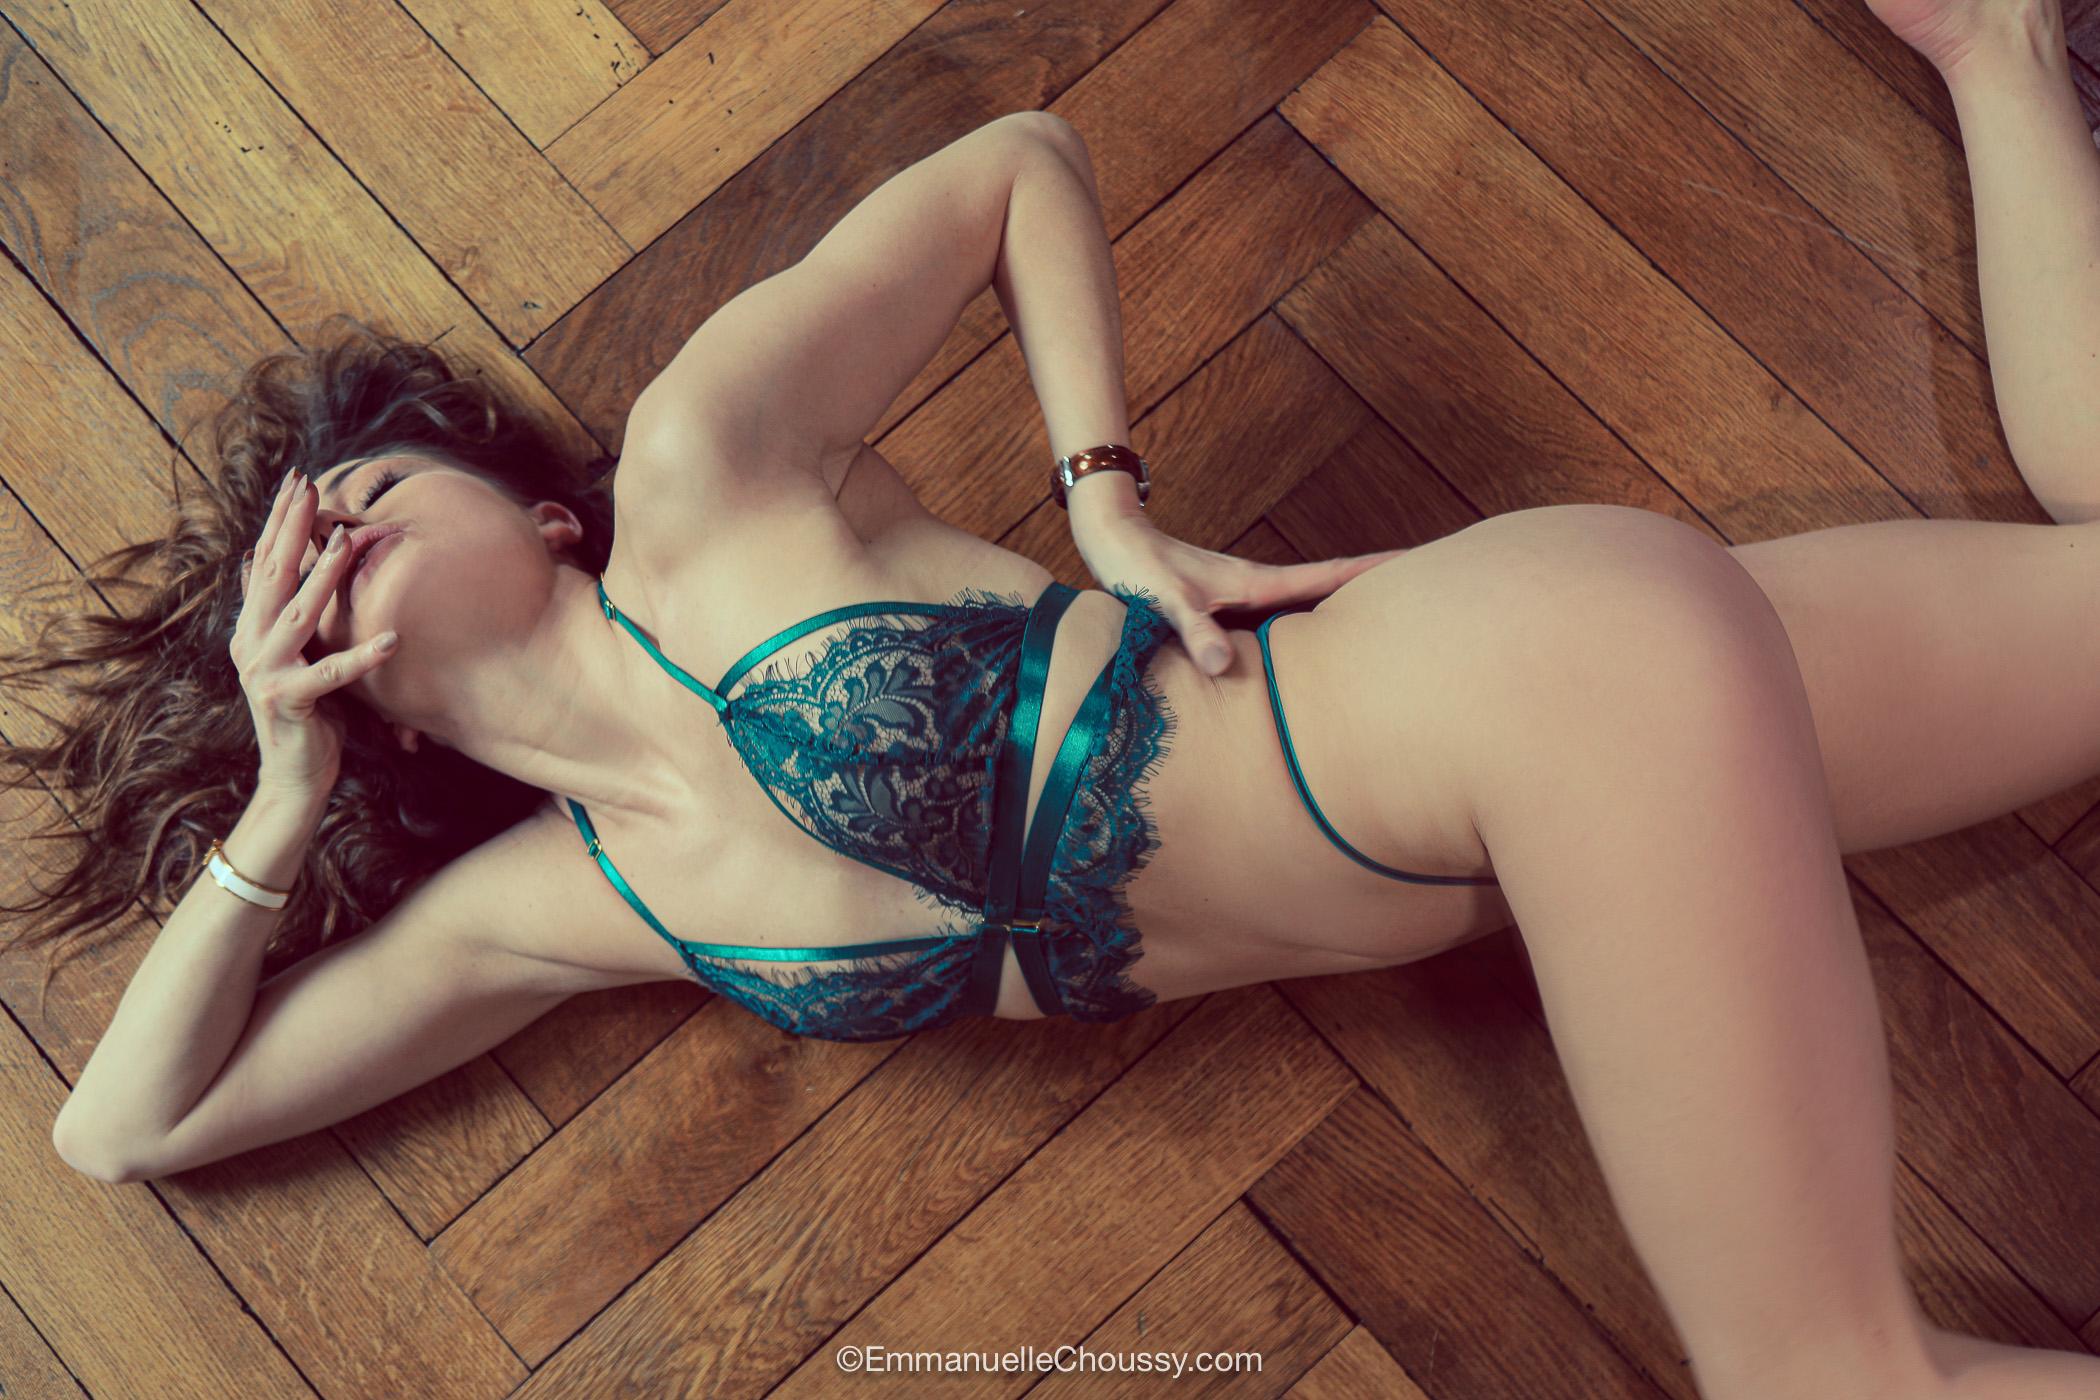 Joana by Emmanuelle Choussy